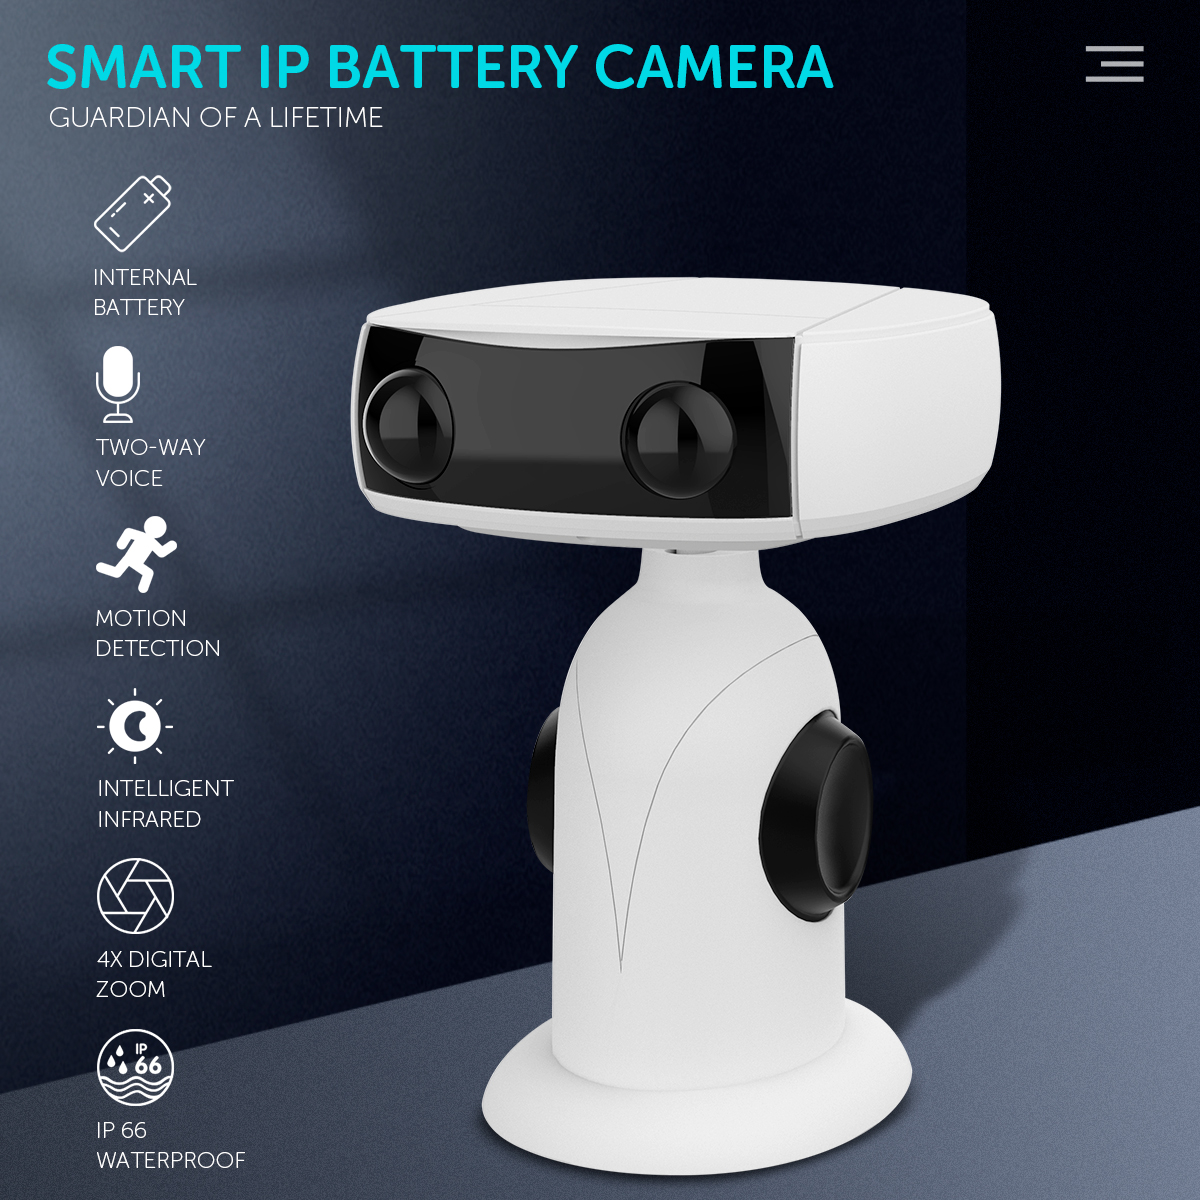 Wireless Camera 1080p 4x Zoom Low Power Wifi Voice Intercom Monitoring Camera white